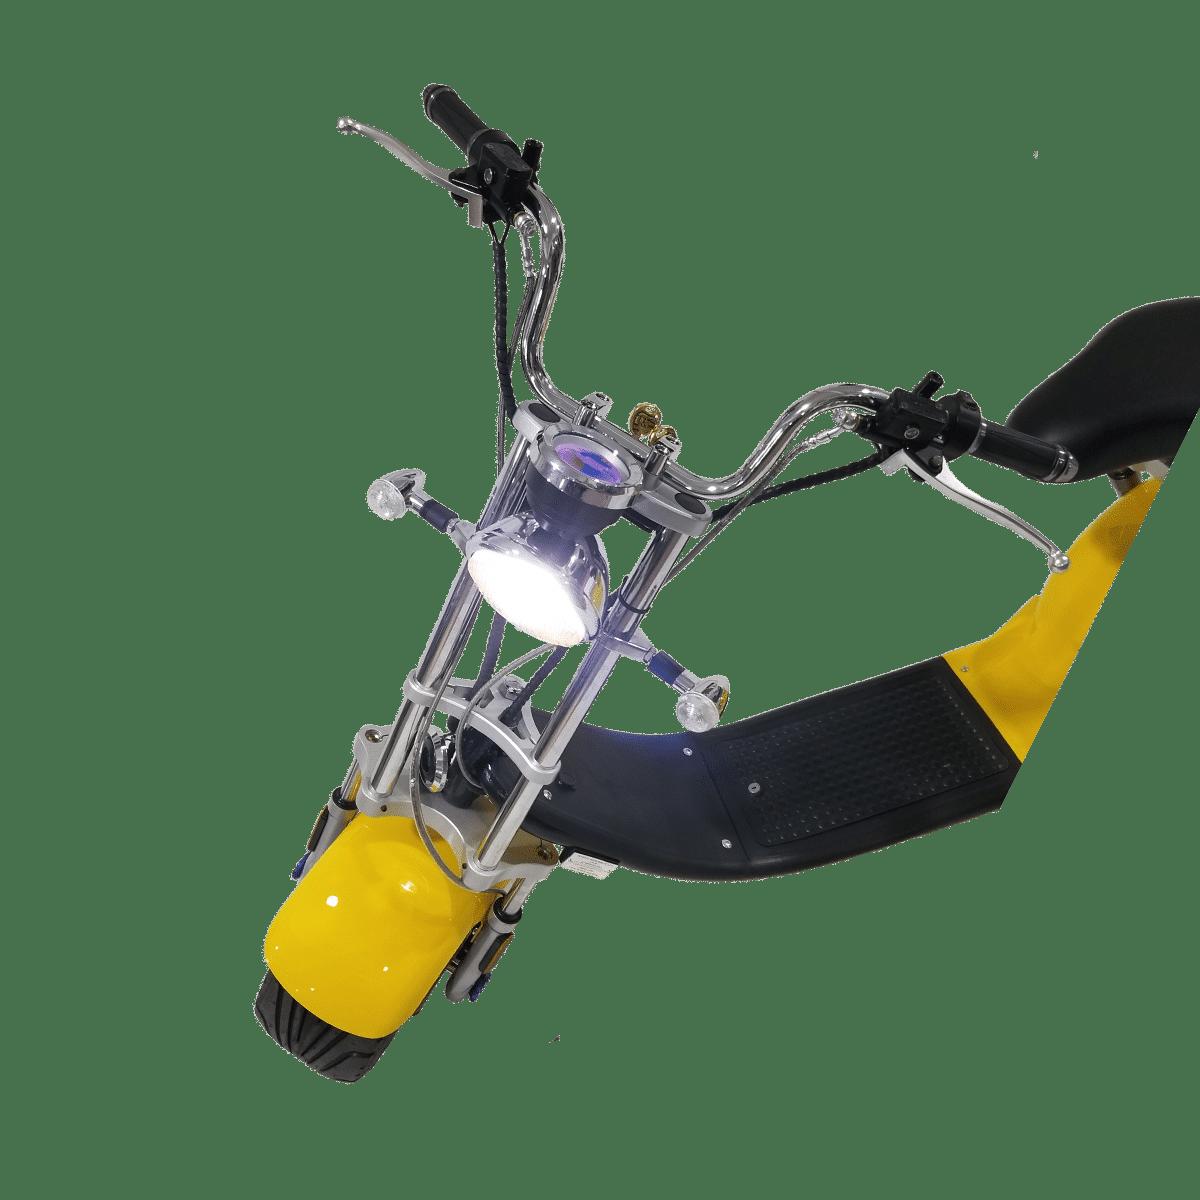 Citycoco Harley Deluxe Jaune avec 1 batterie offerte en plus 3